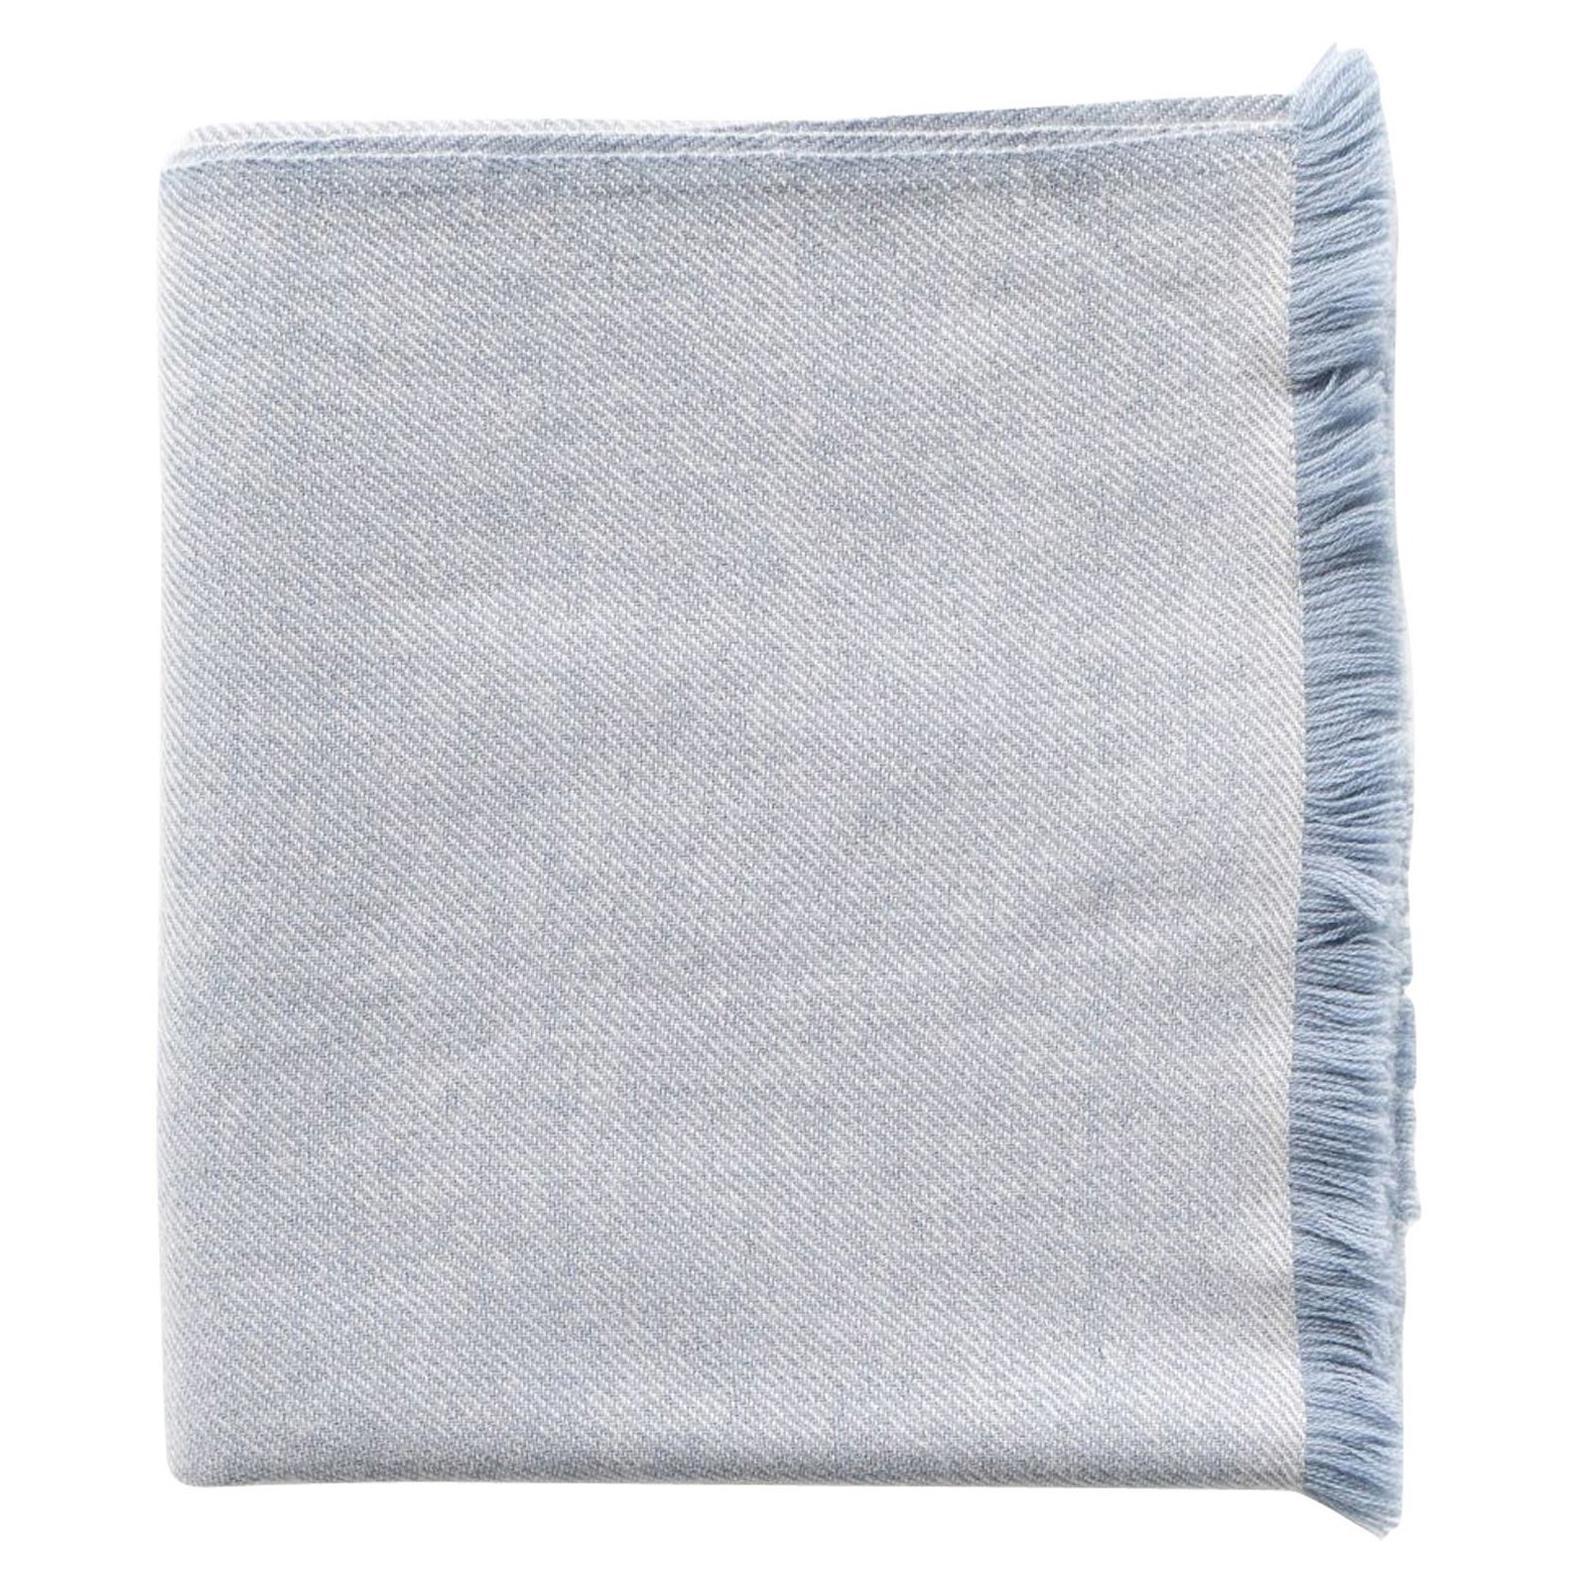 Boro Blue Shade Queen Size Bedspread / Coverlet Handwoven in Soft Merino